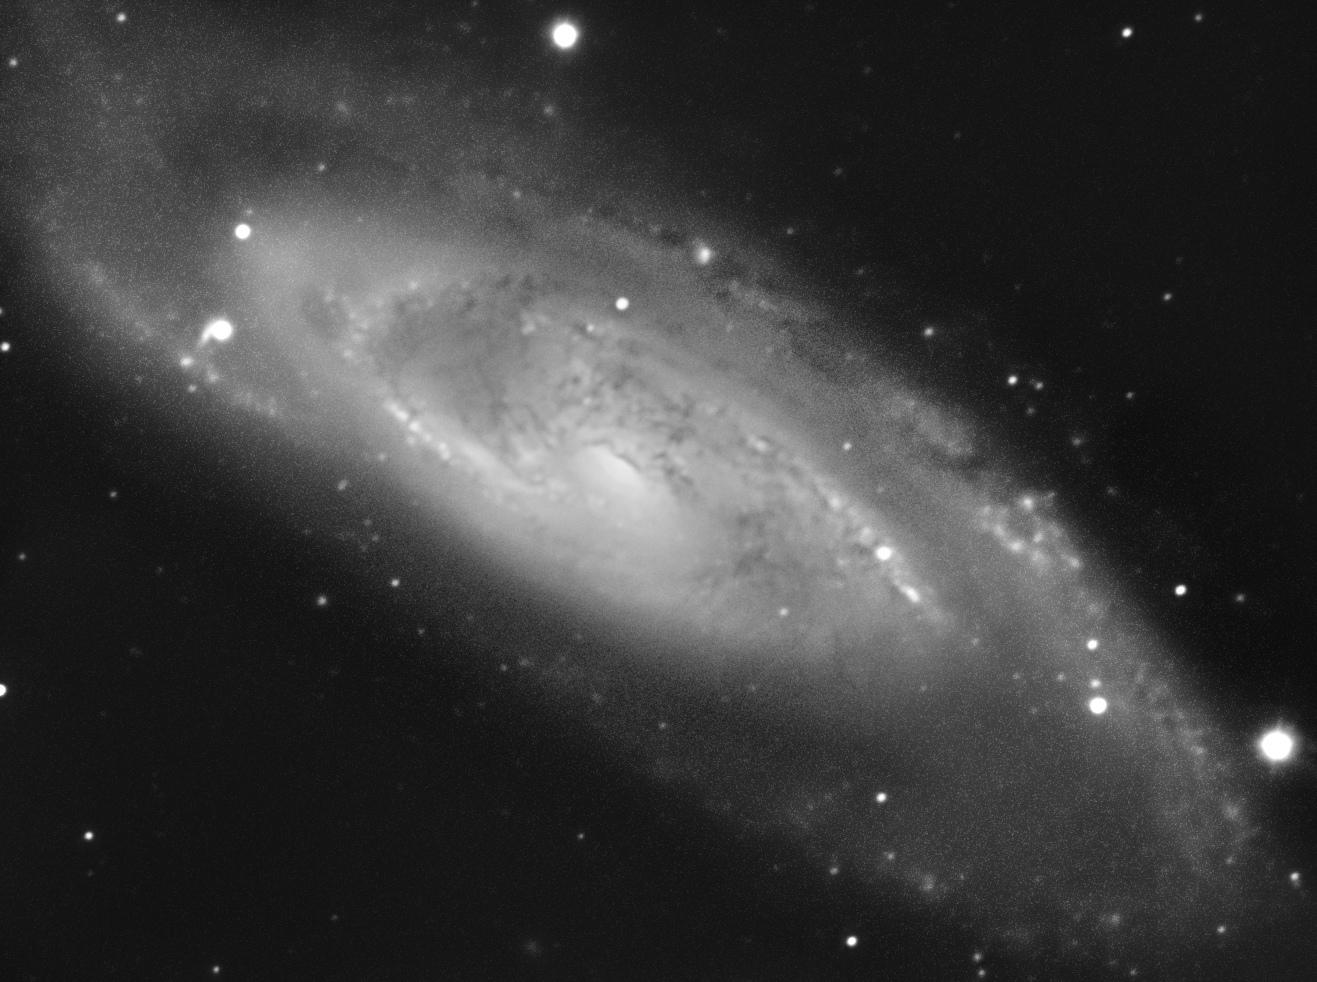 M106_ATIK314L-C9_16x300s_20180503.jpg